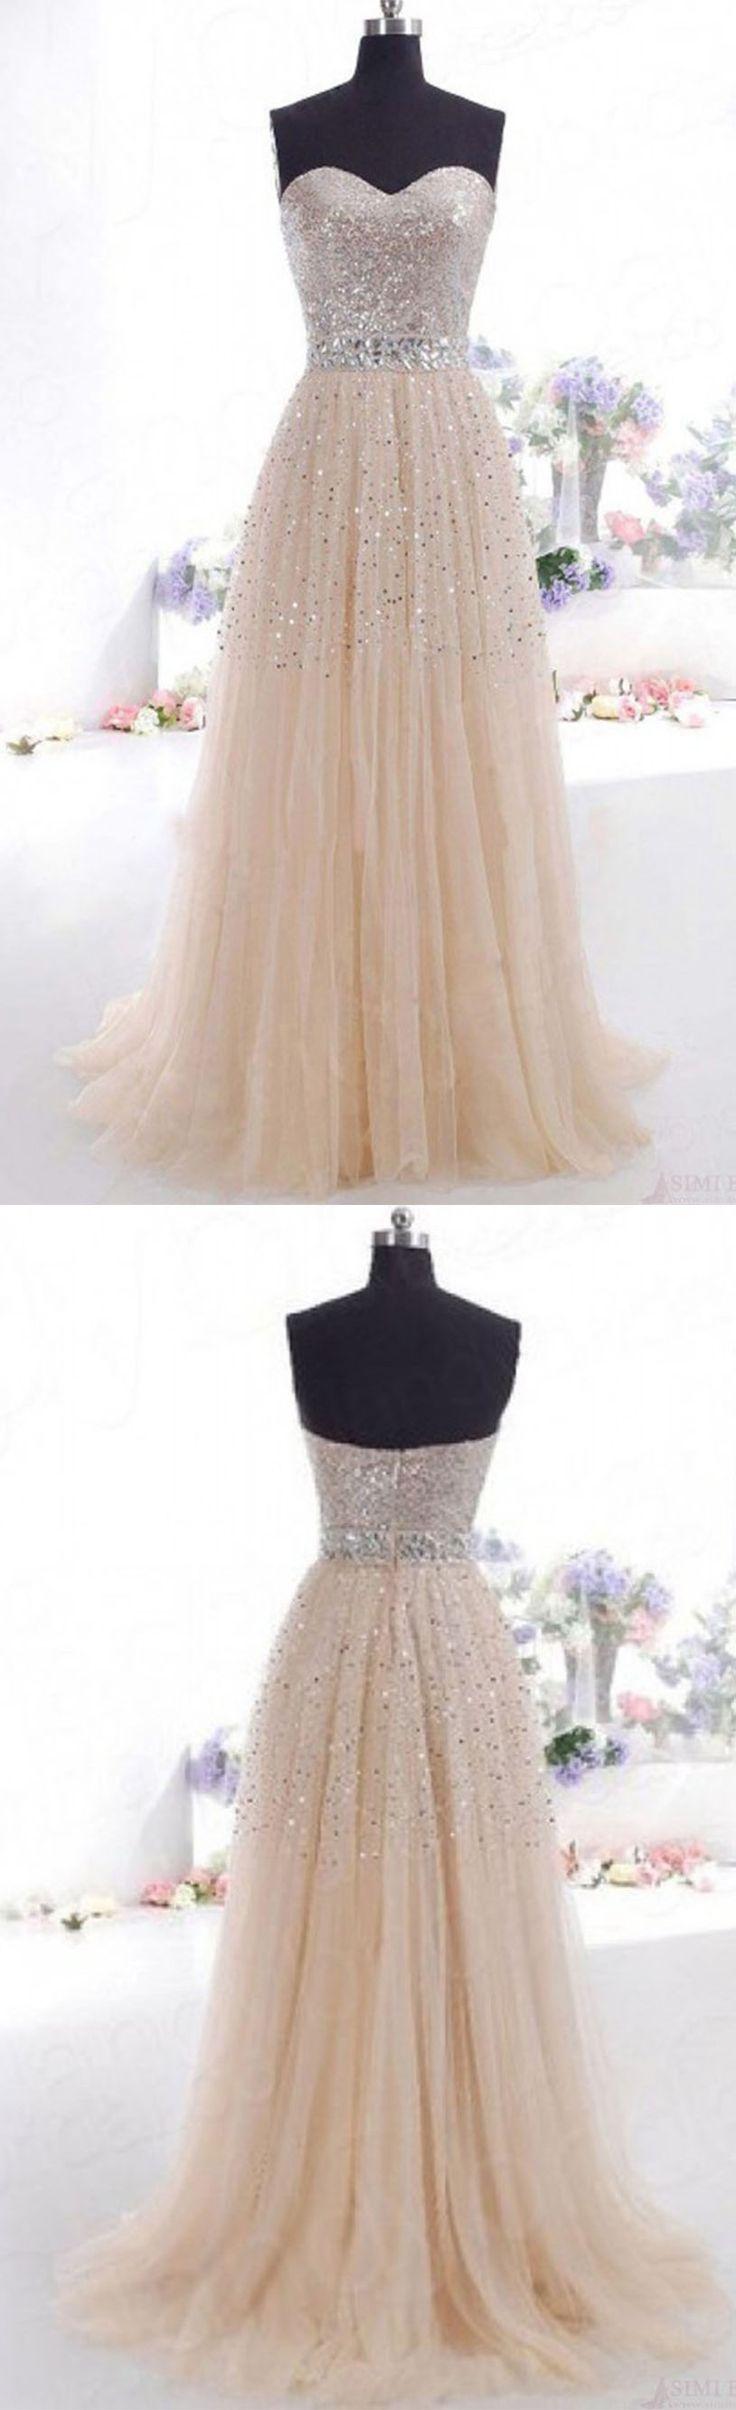 Fabulous A-Line Sweetheart Natural Floor Length Champagene Sleeveless Zipper Prom Evening Dress